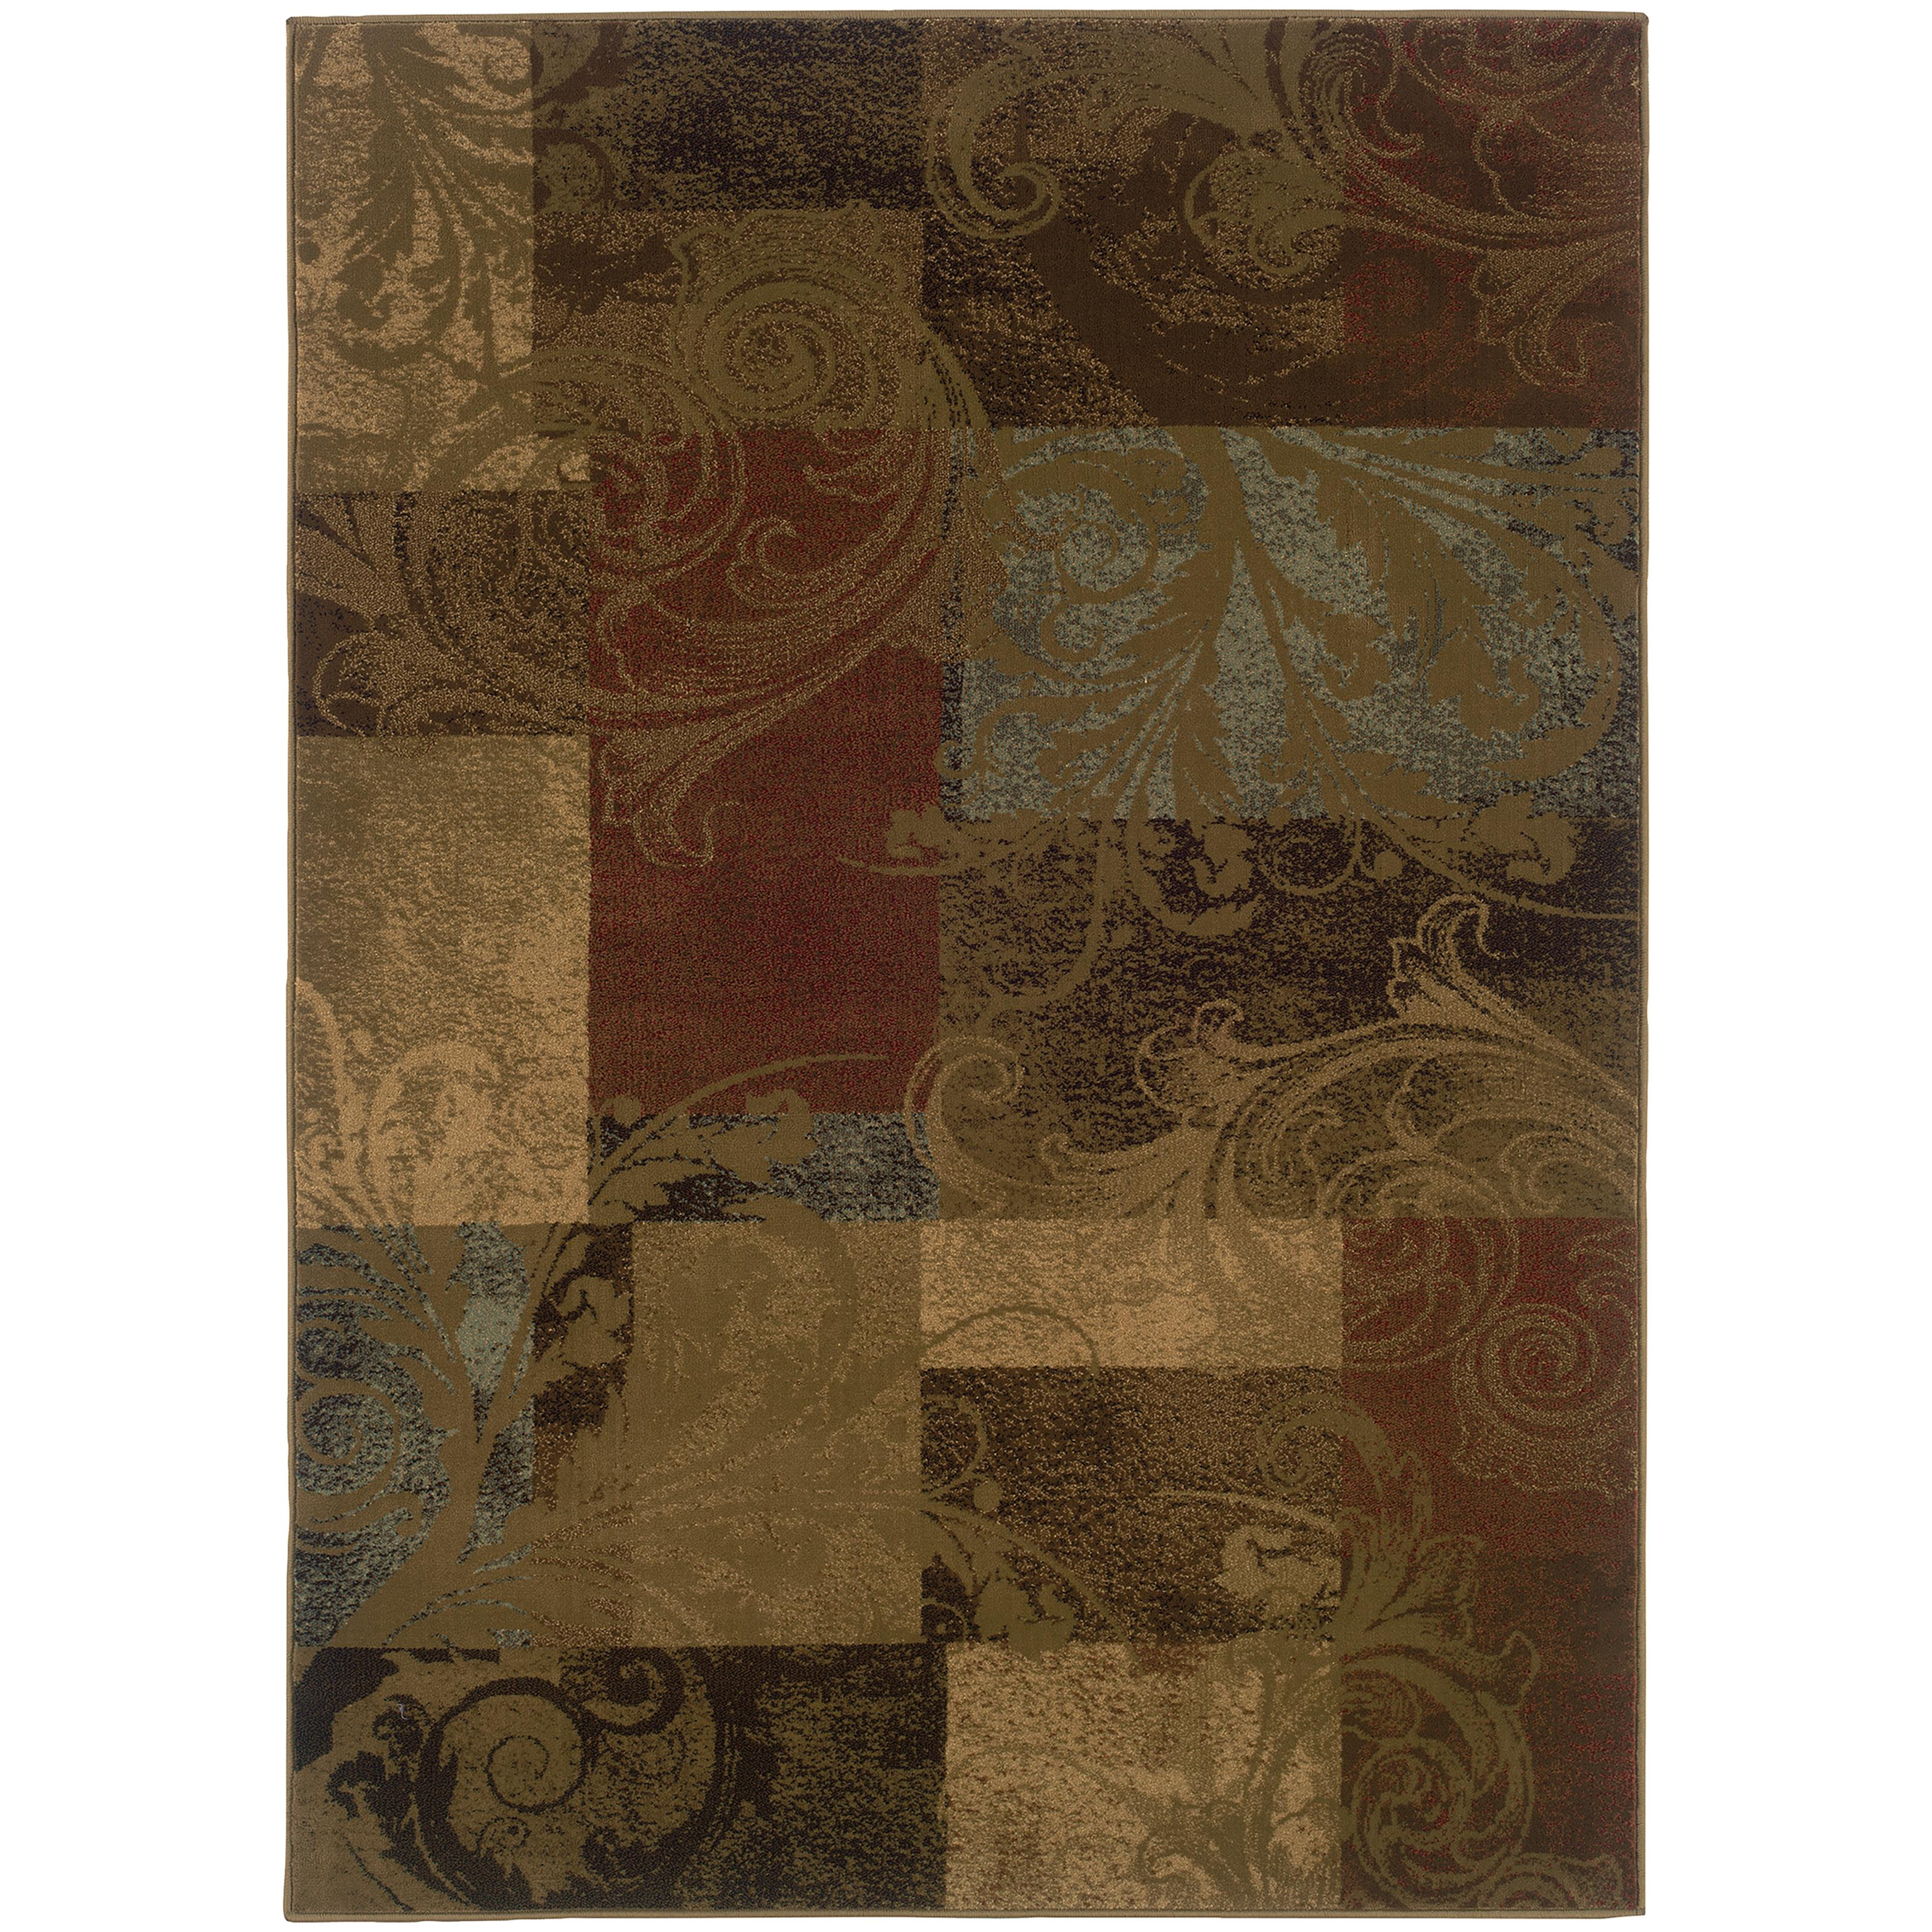 Oriental Weavers Hudson 10' X 13' Rug - Item Number: H036G1306396ST